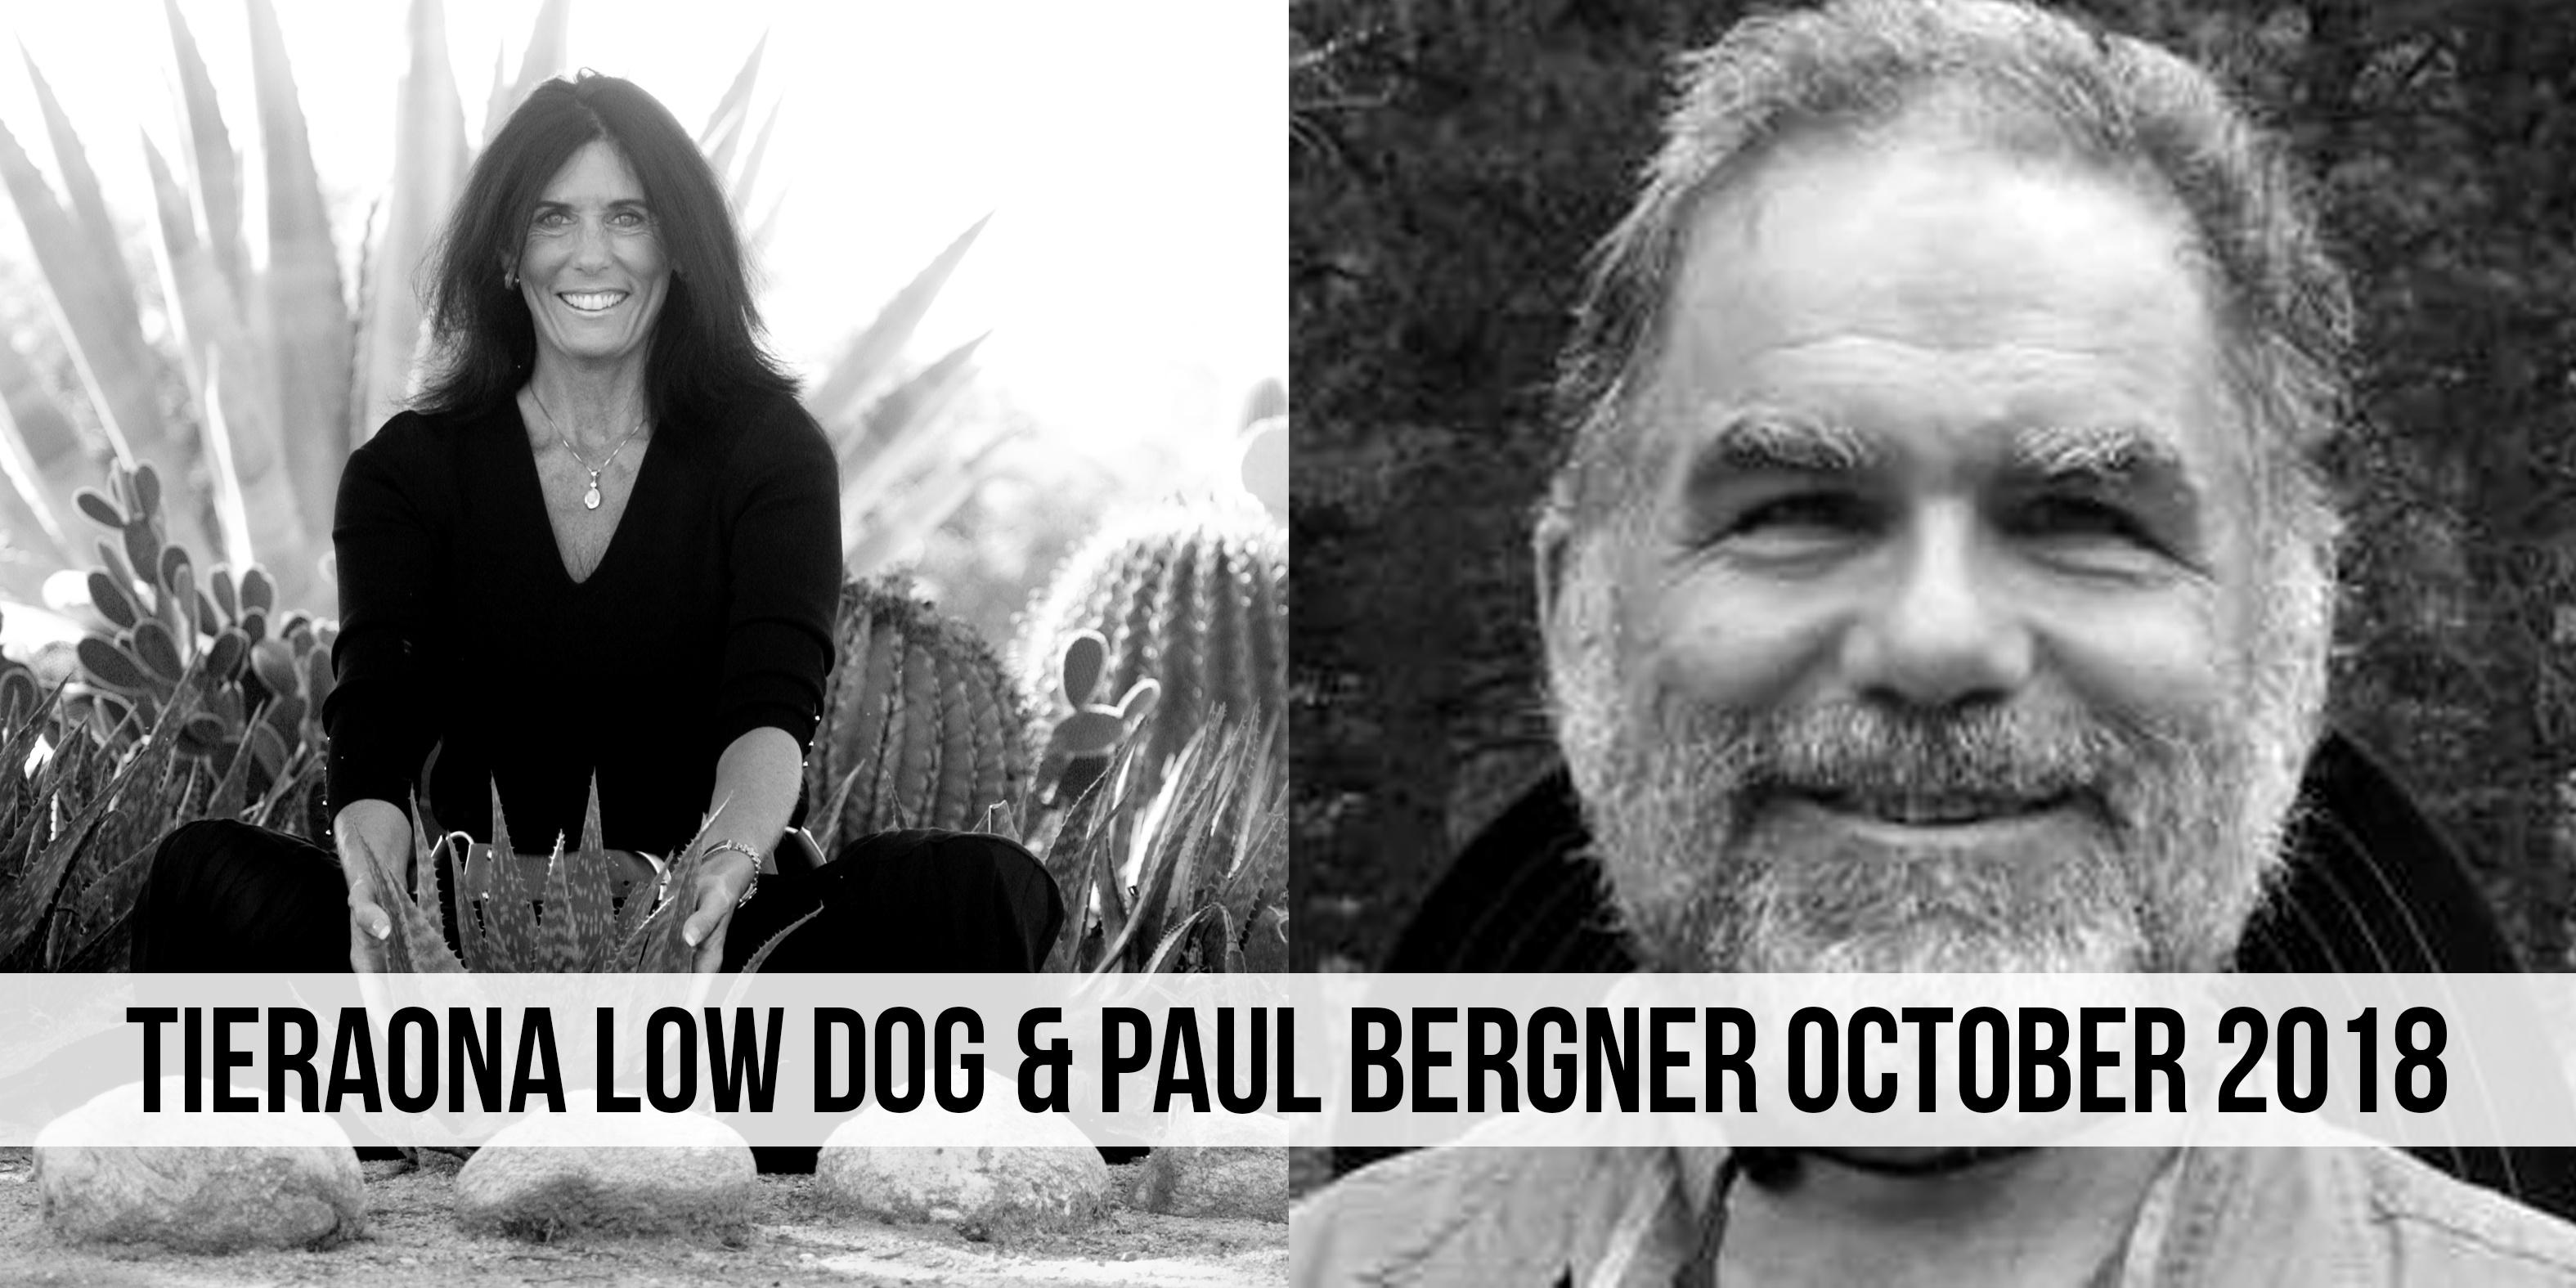 Tieraona Low Dog & Paul Bergner